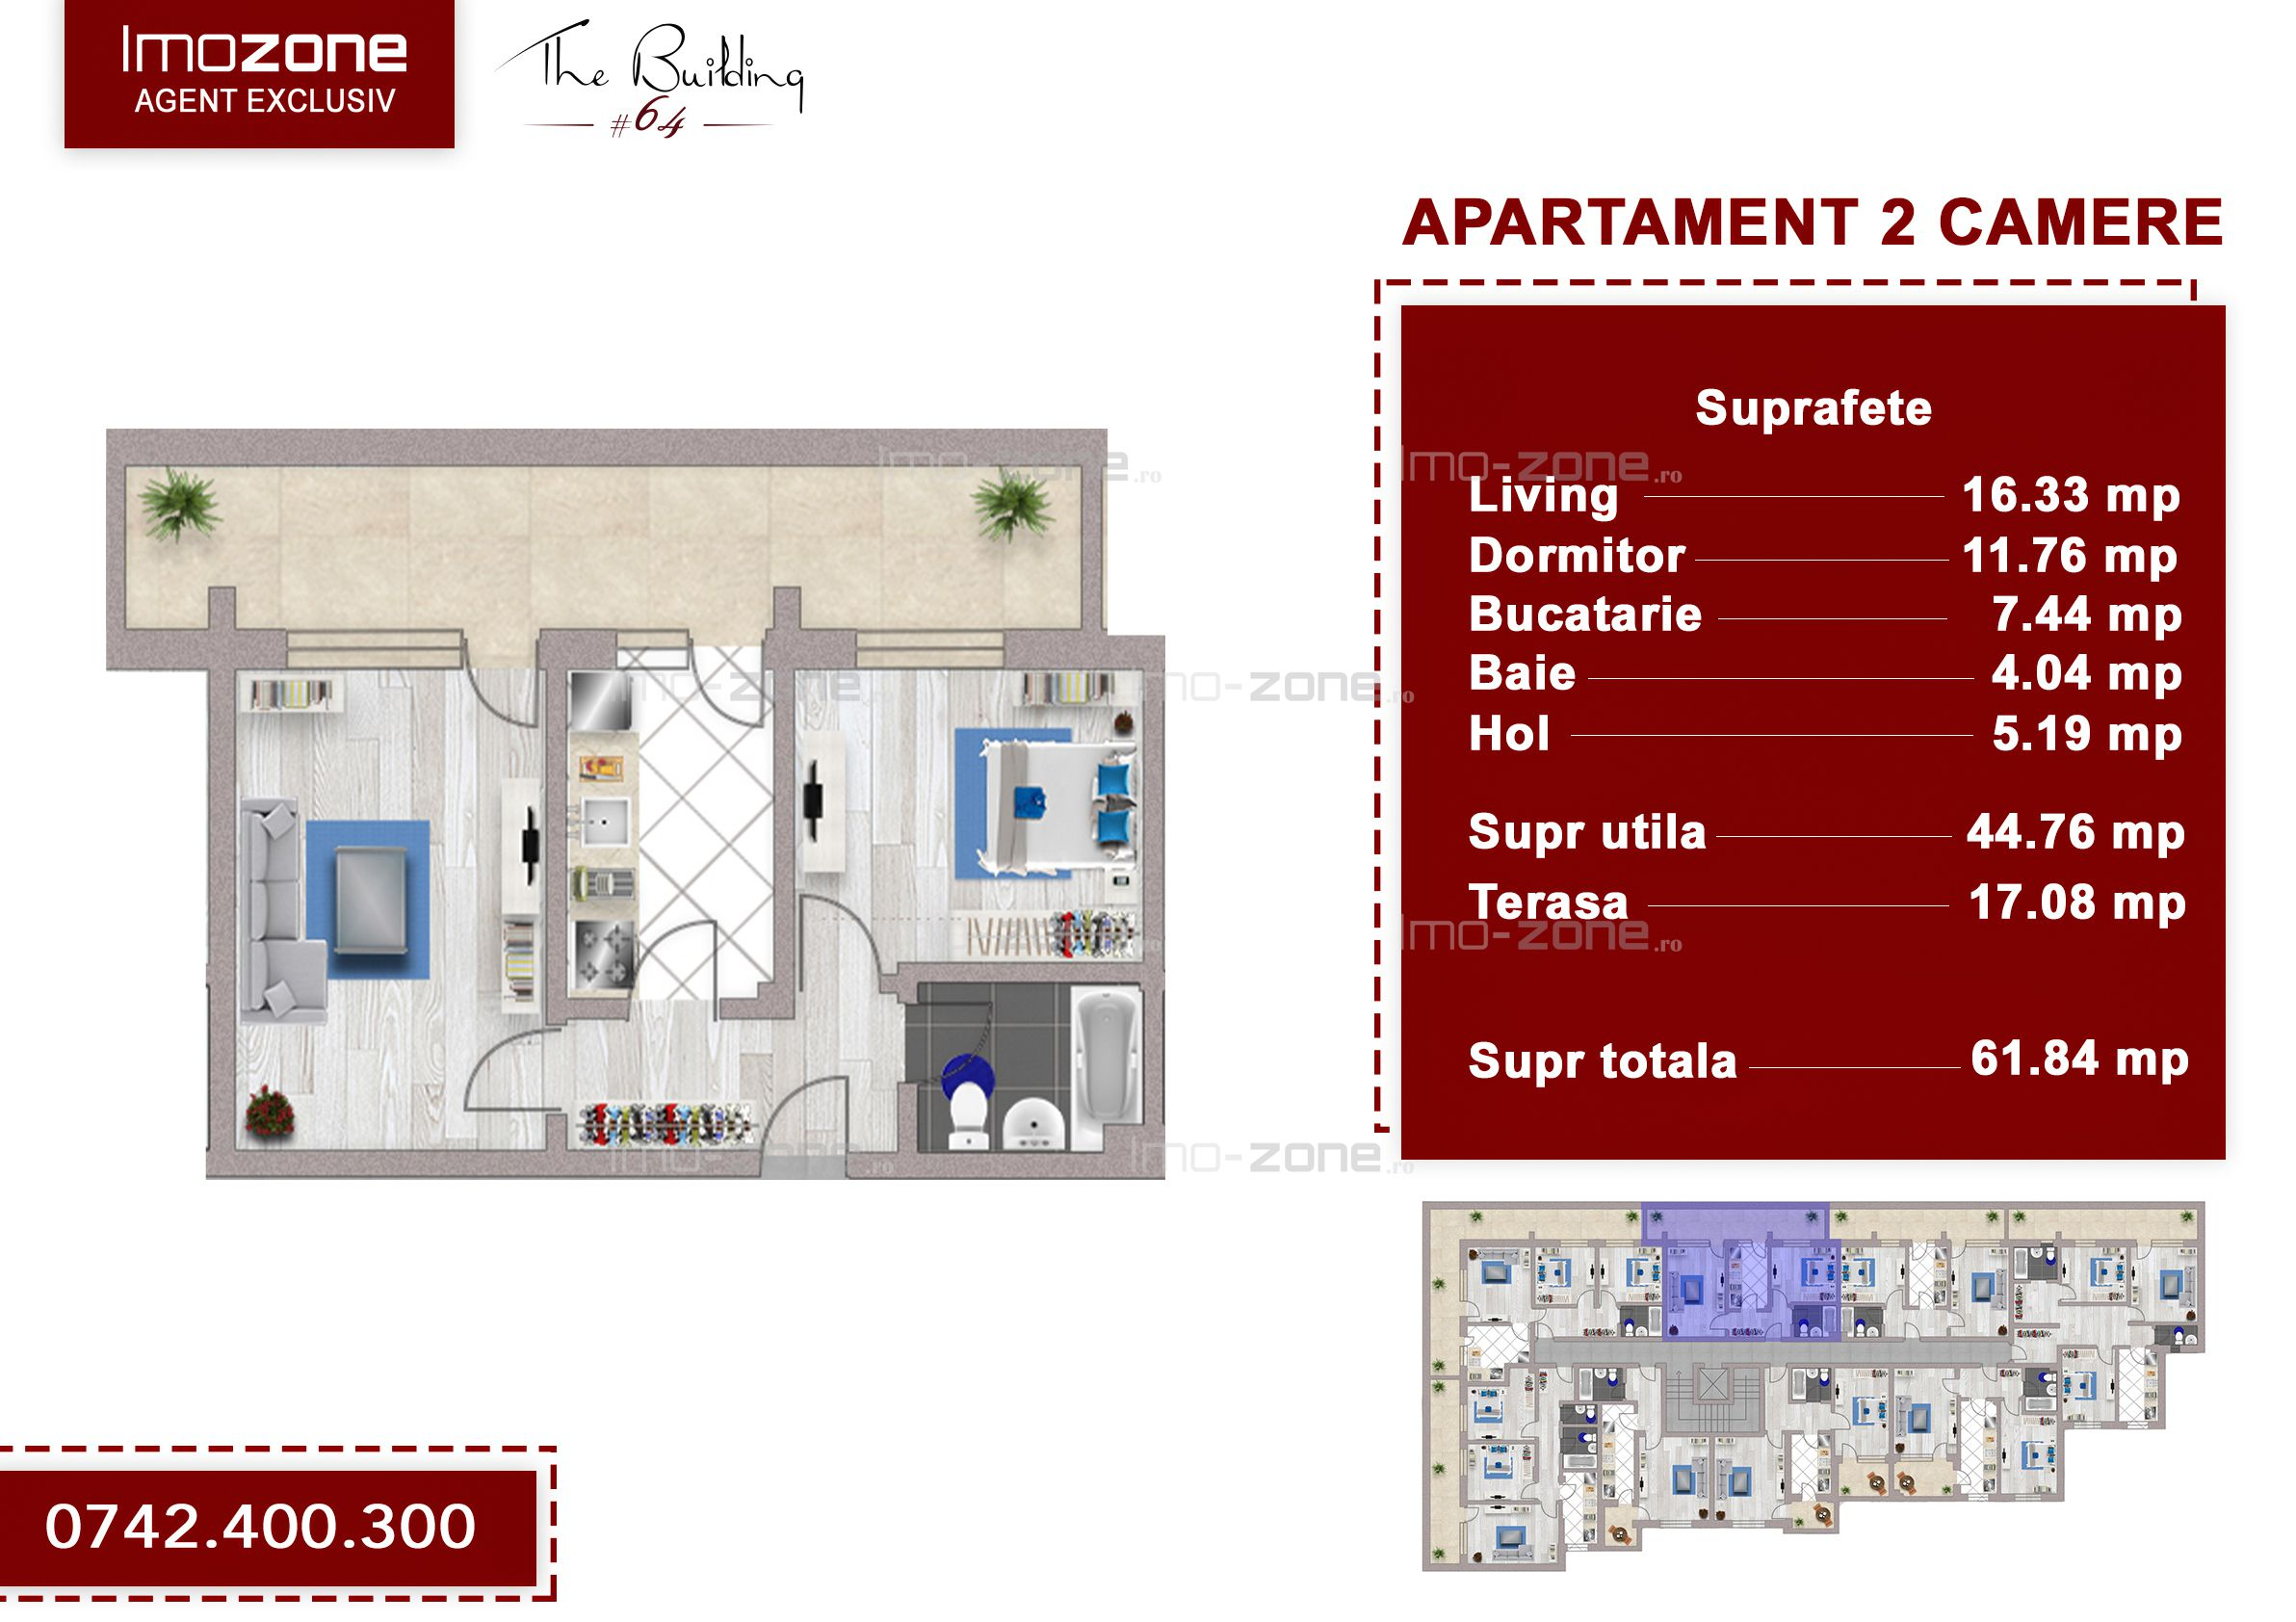 Apartament 2 camere + terasa 17 mp, Drumul Taberei, Valea Doftanei, ANL Brancusi